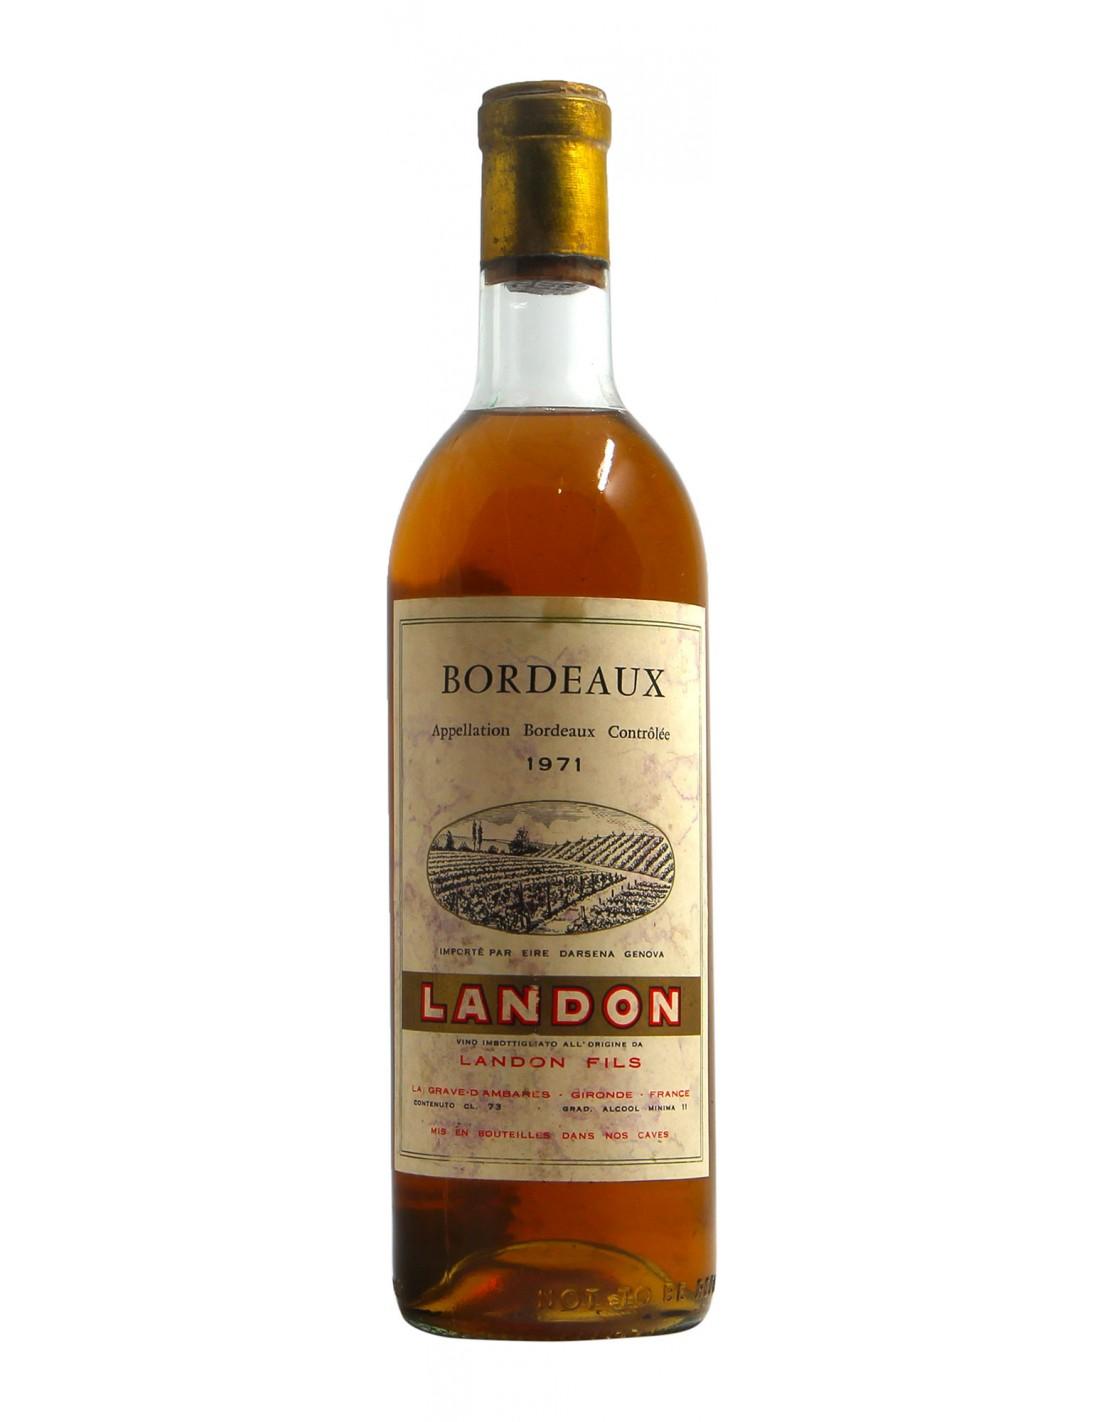 BORDEAUX 1971 LANDON Grandi Bottiglie